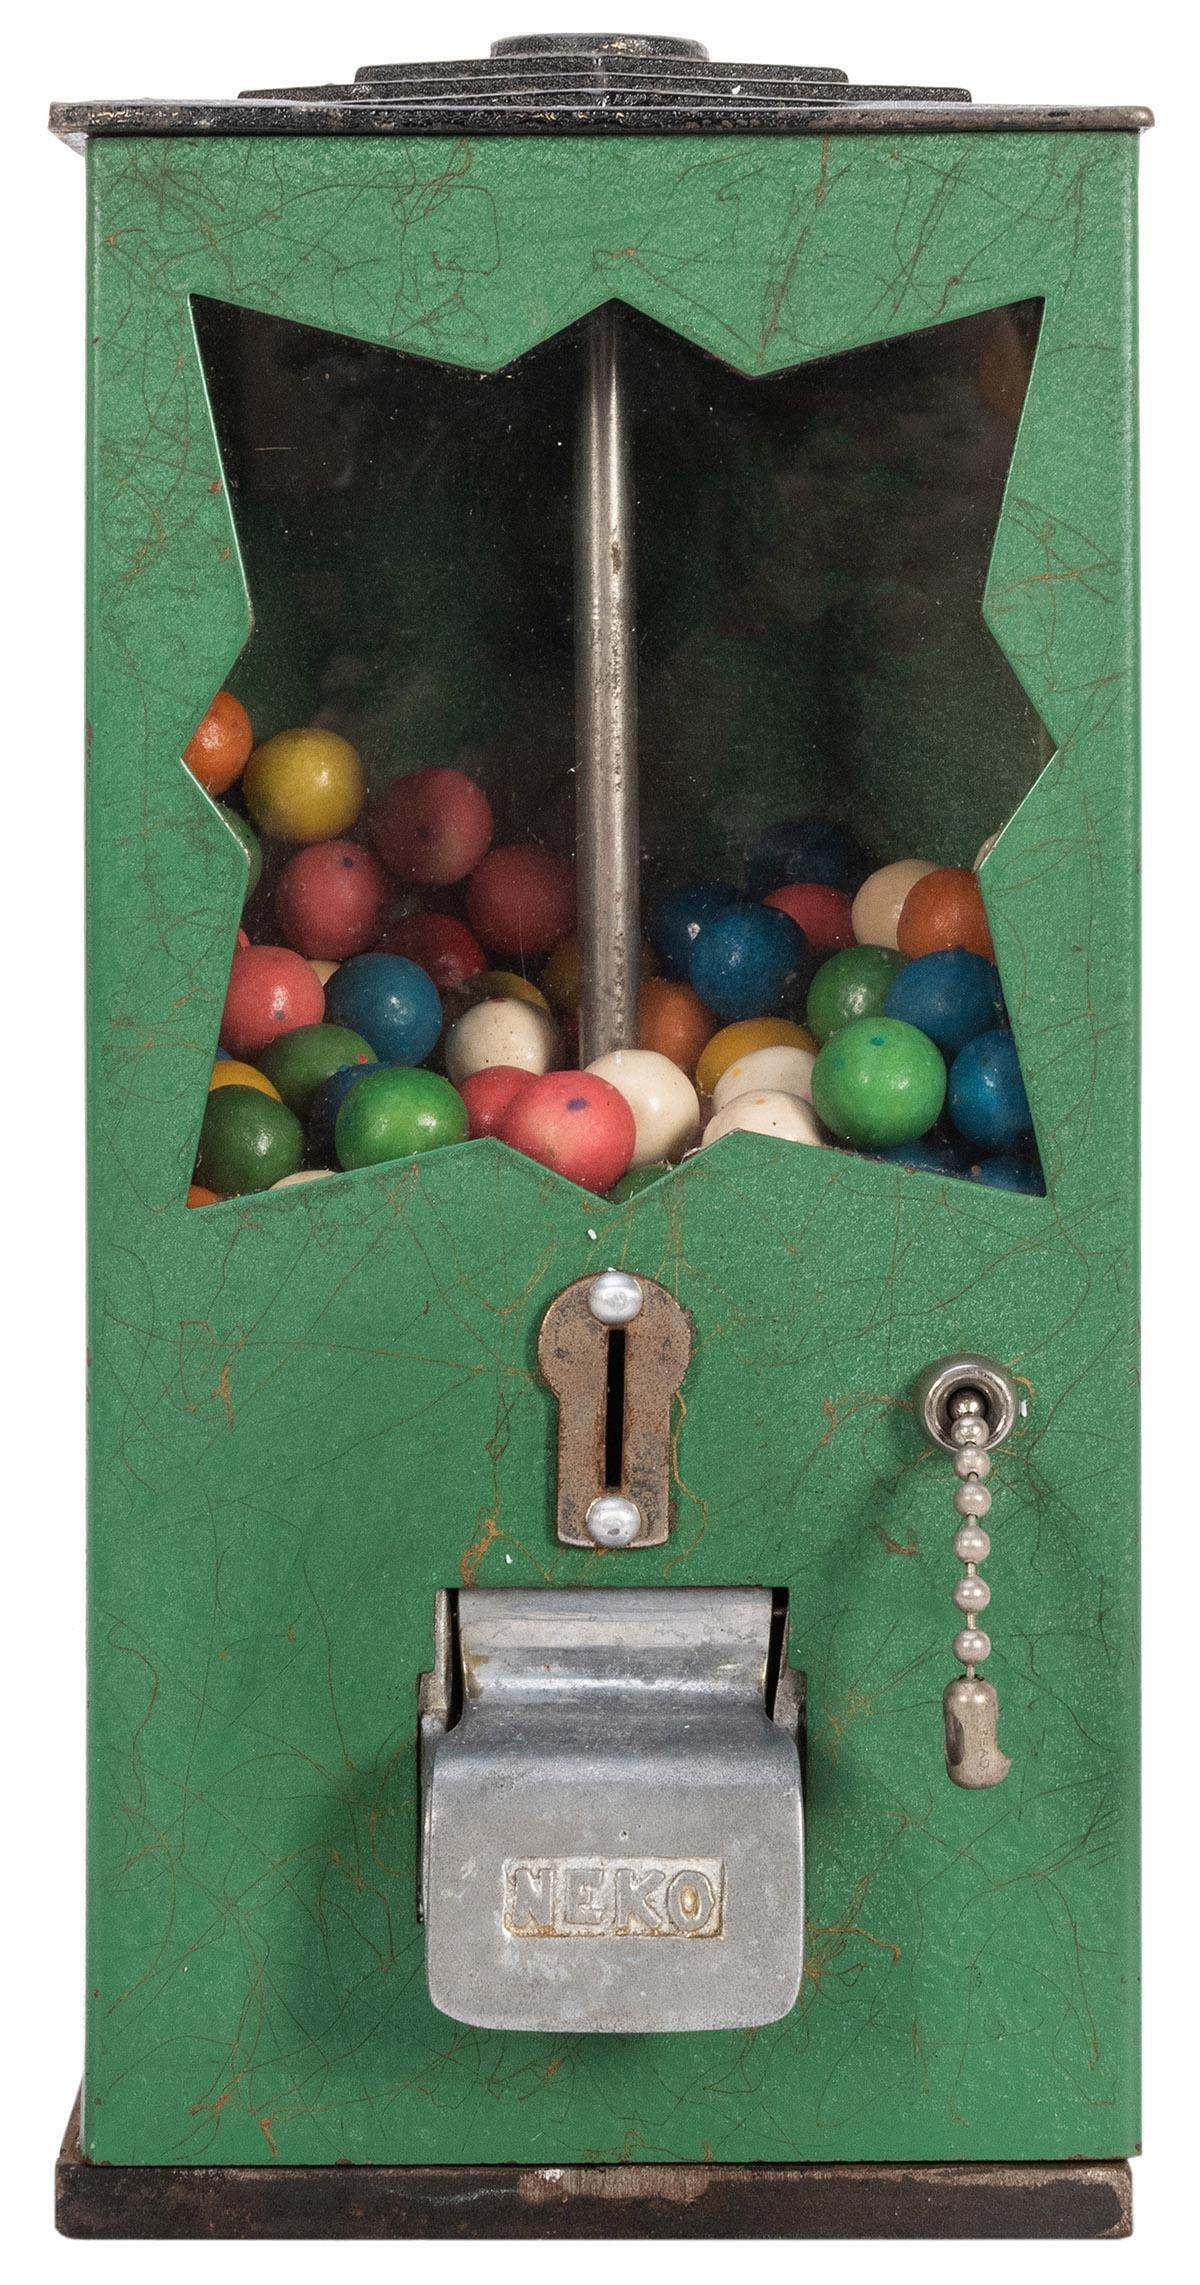 Neko Bulk Vendor. National Co., ca. 1935. Green metal